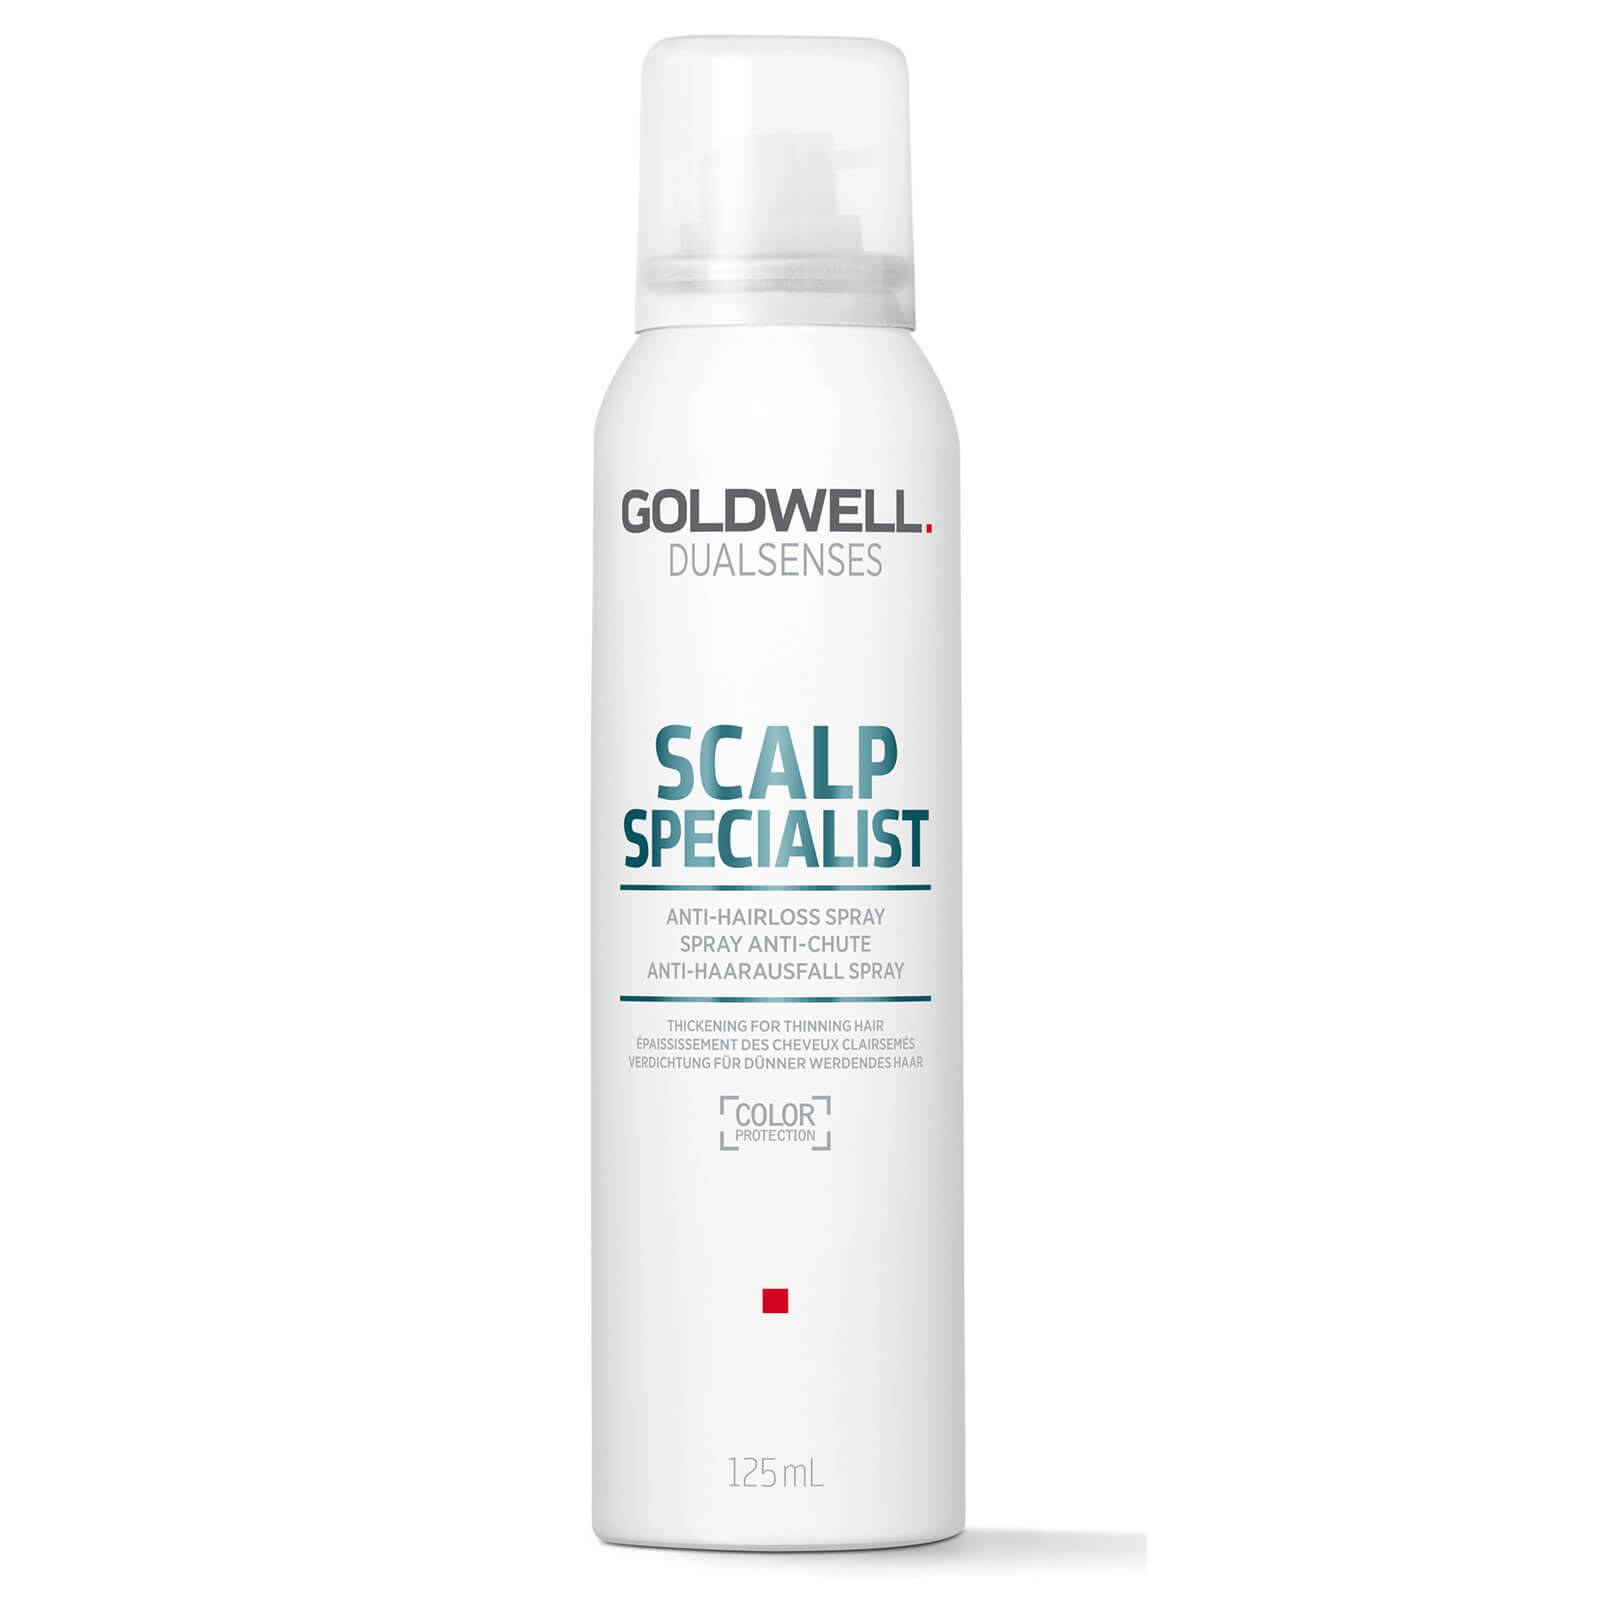 Goldwell Spray anti-chute Scalp Specialist Goldwell Dualsenses 125ml